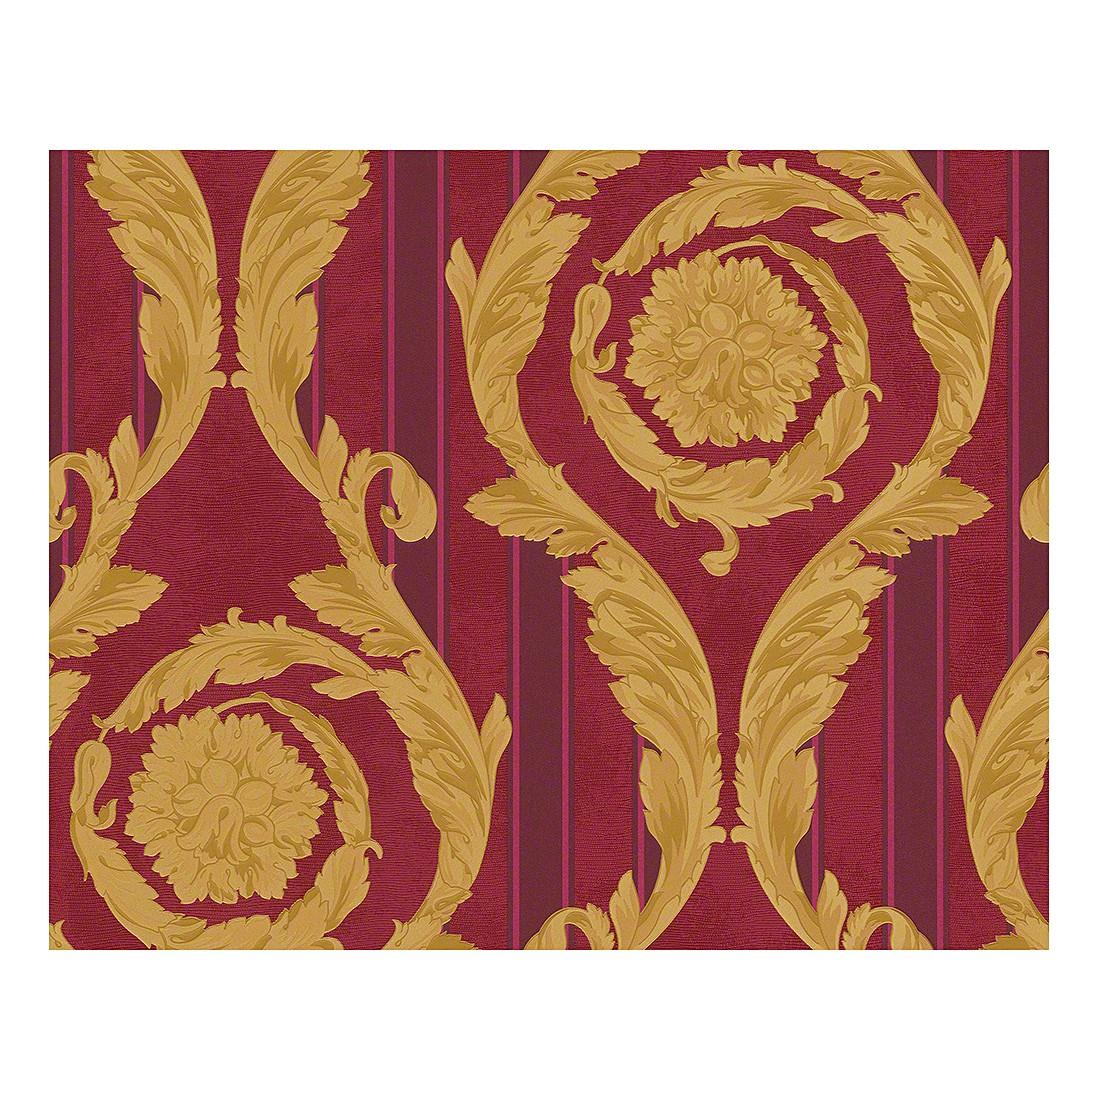 Tapete Barocco and Stripes – rotviolett – himbeerrot – goldfarben – fein strukturiert, VERSACE Home online bestellen